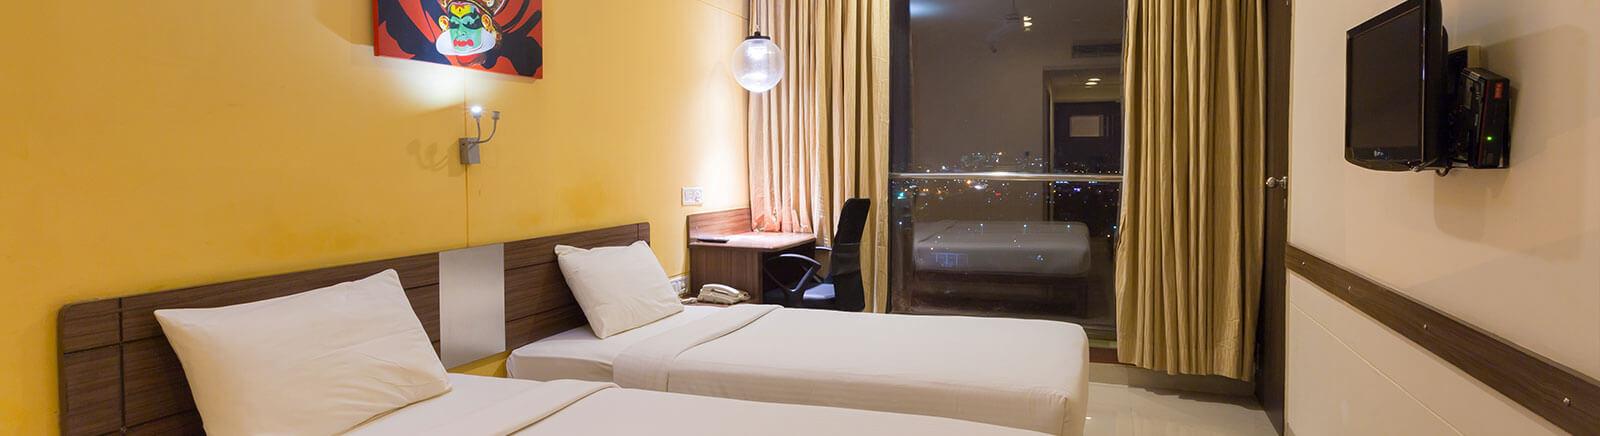 Ginger Chennai (Tharamani, IITM) Rooms